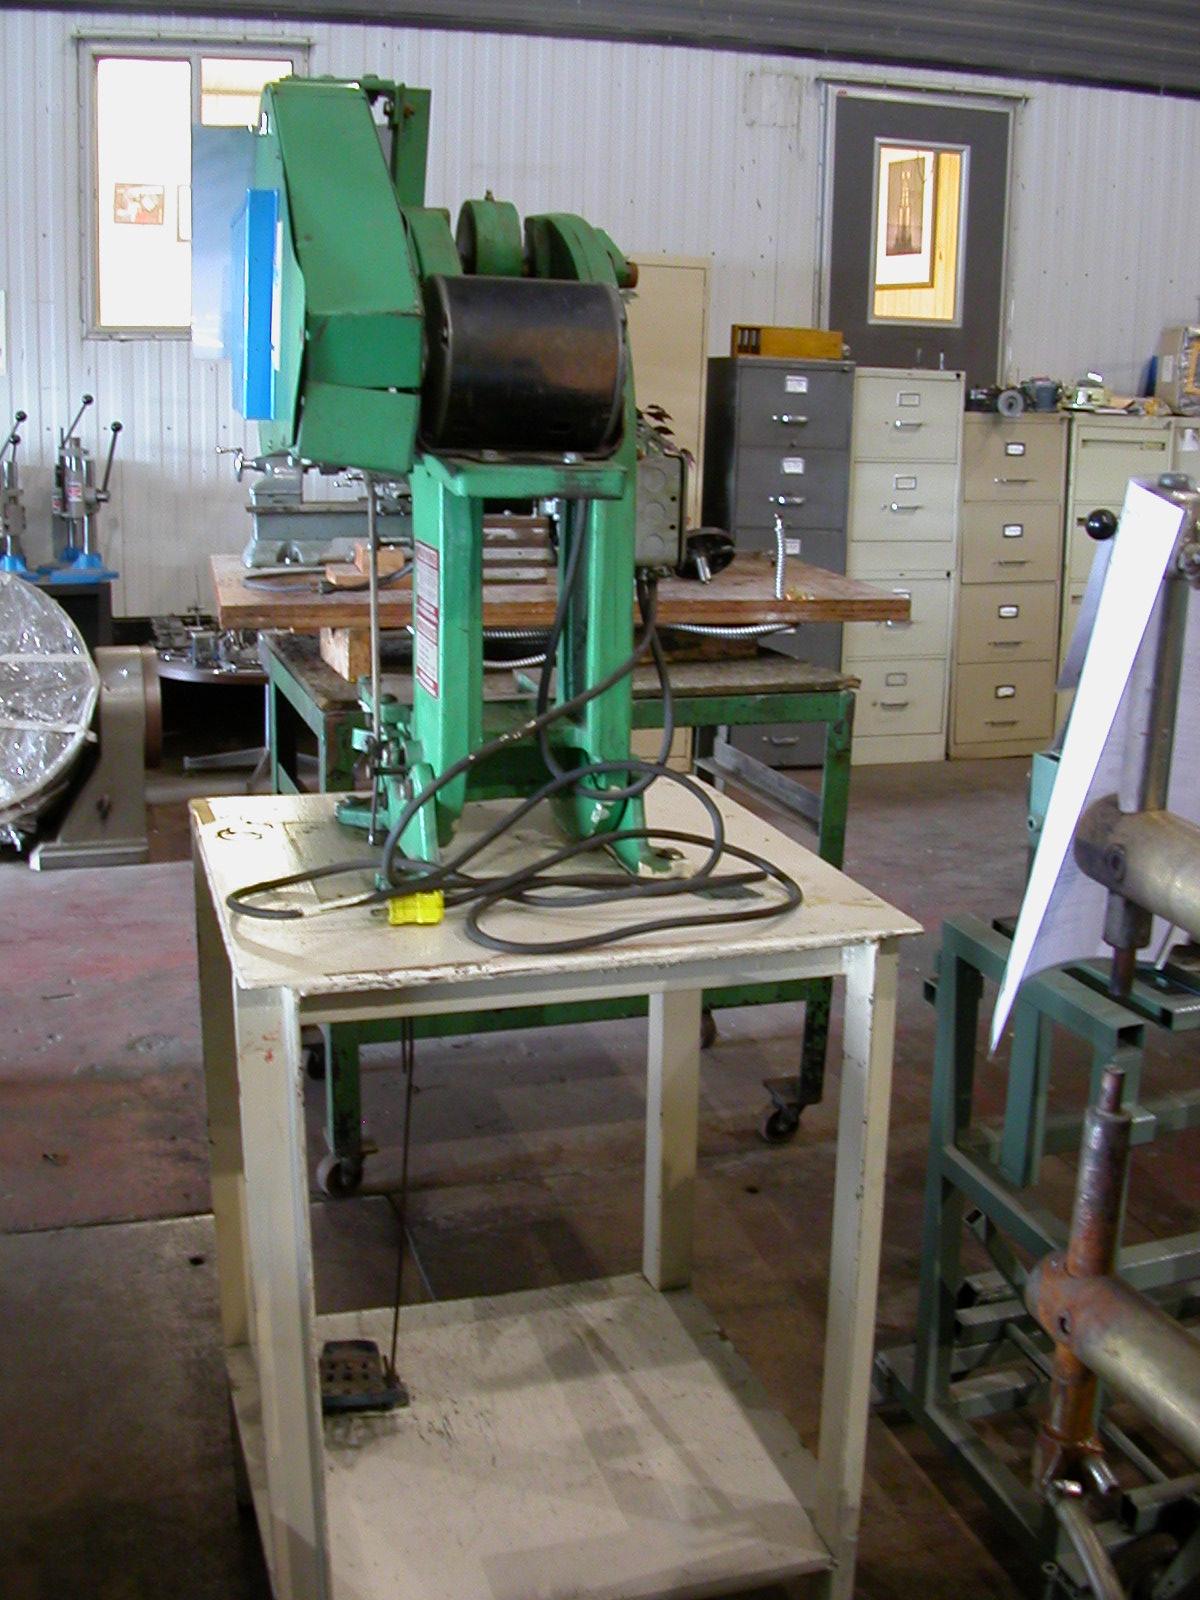 187 5 Ton Benchmaster Model 152 Mechanical Obi Punch Press